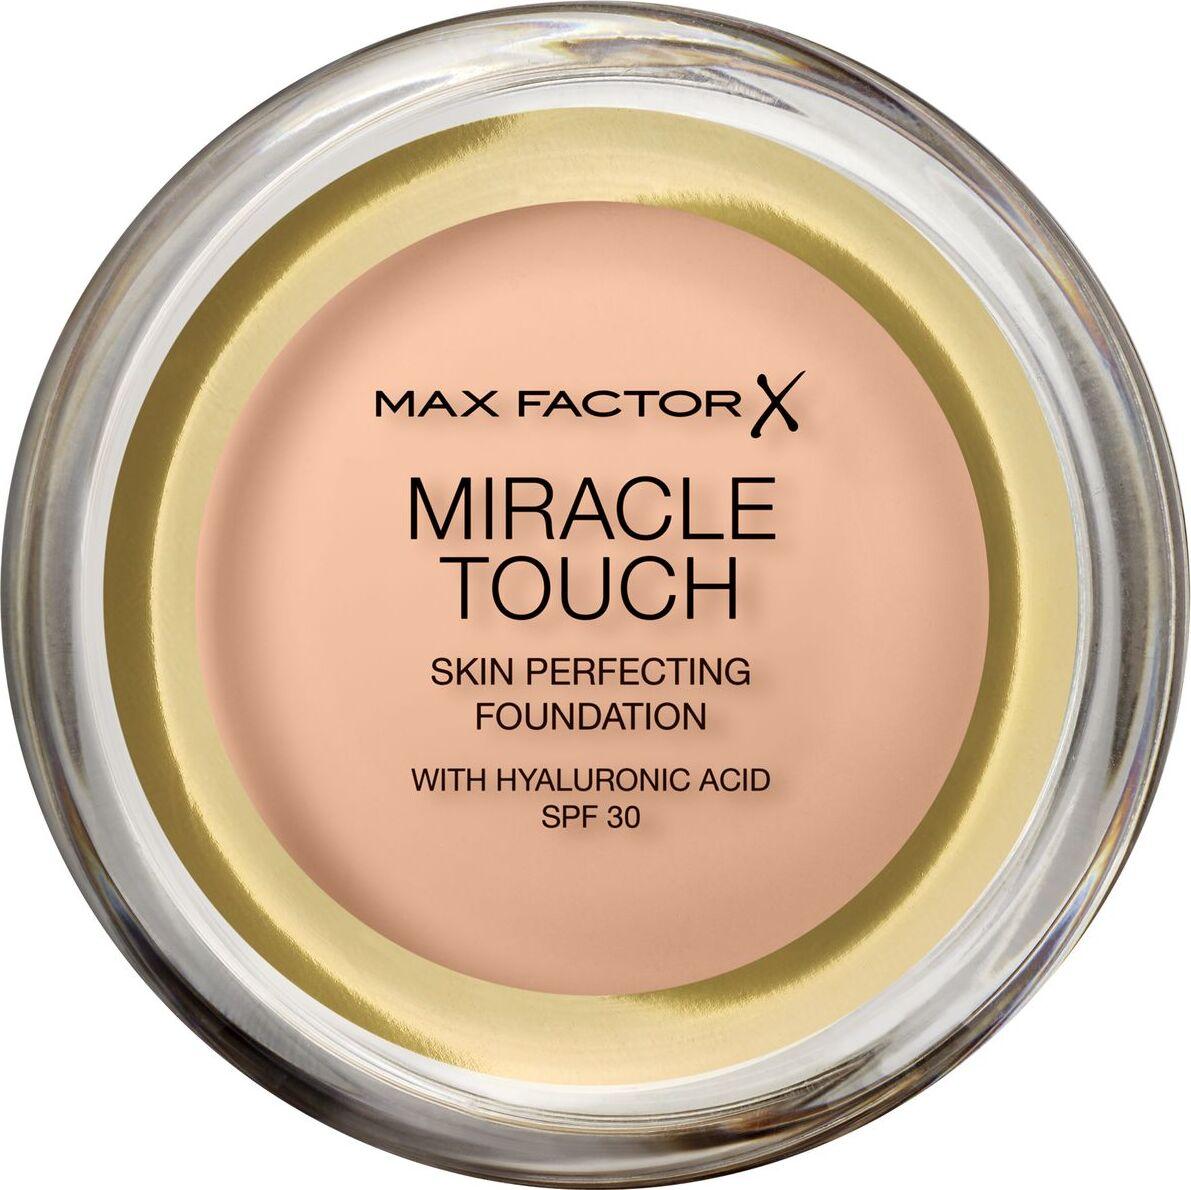 Тональная основа Max Factor Miracle Touch, SPF 30, тон 35 Pearl Beige, 11 мл основа под макияж max factor miracle prep colour correcting cooling тон green 30 мл